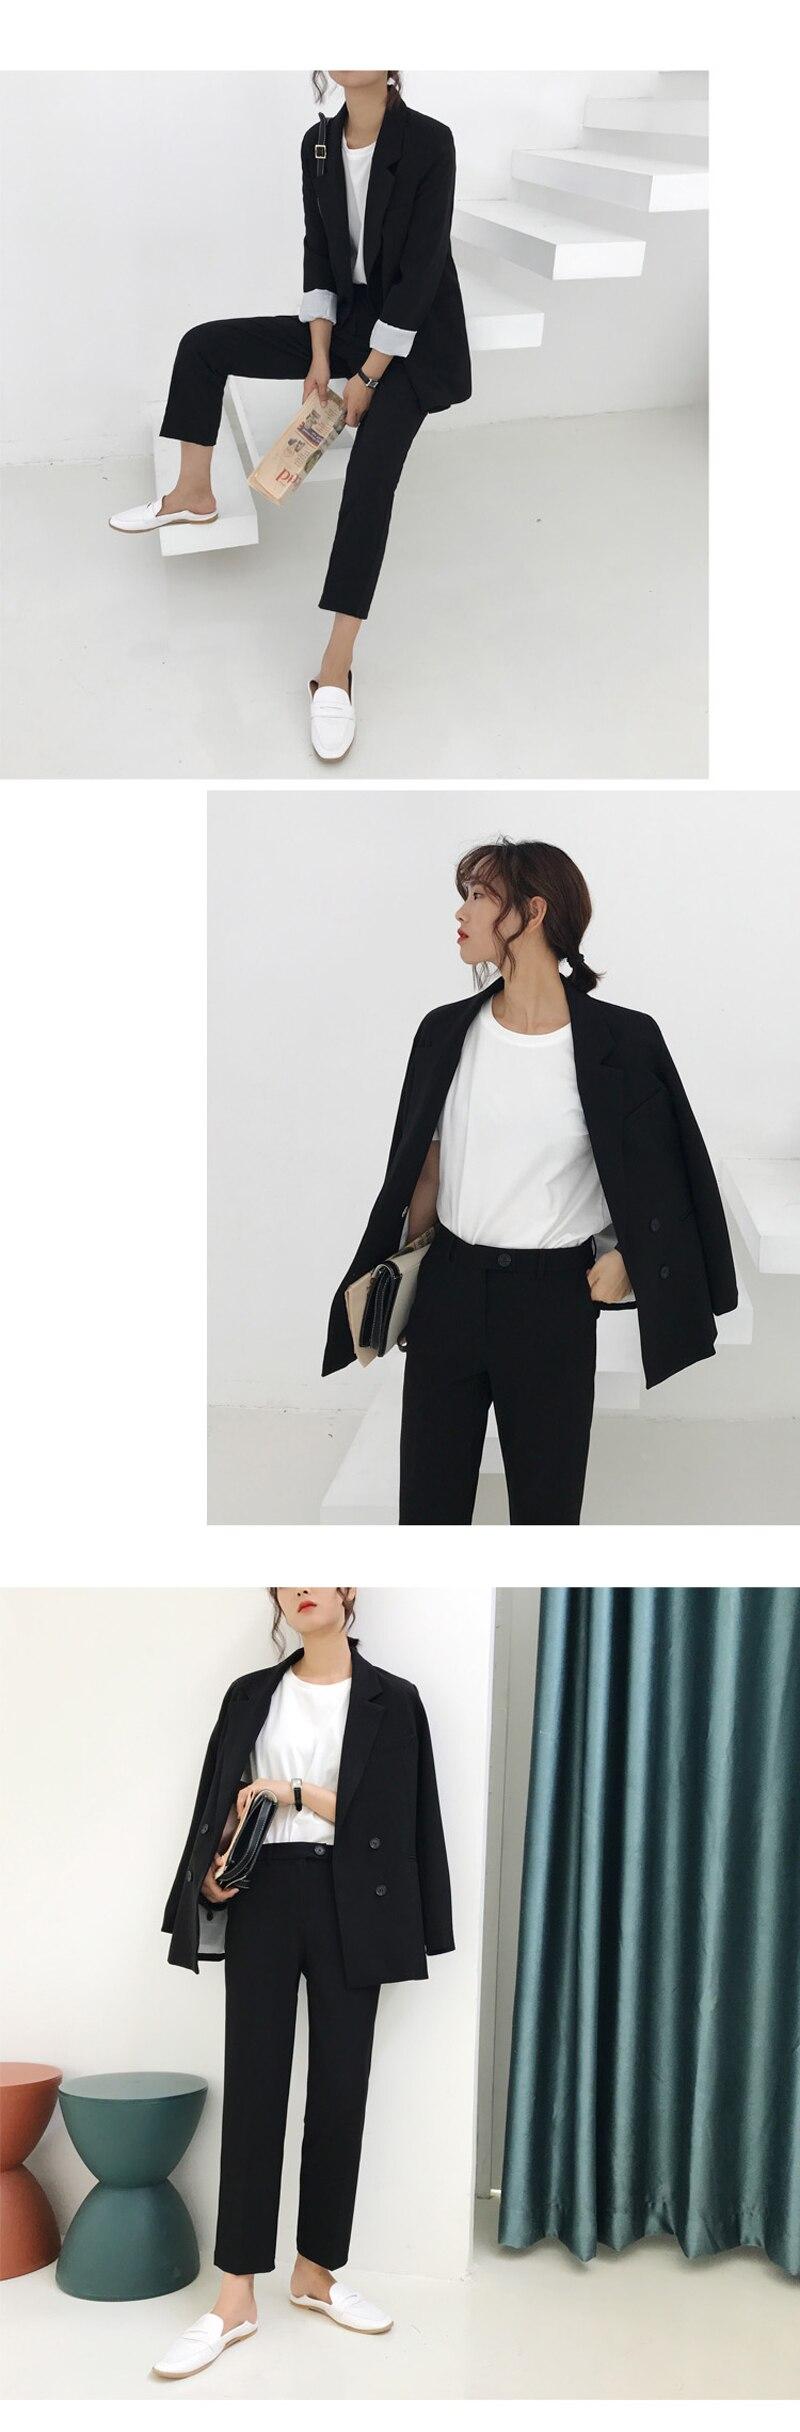 BGTEEVER Vintage Light Green Women Suits Double Breasted Female Pant Suits Blazer Jacket & Pencil Pant Casual 2 Pieces set femme 9